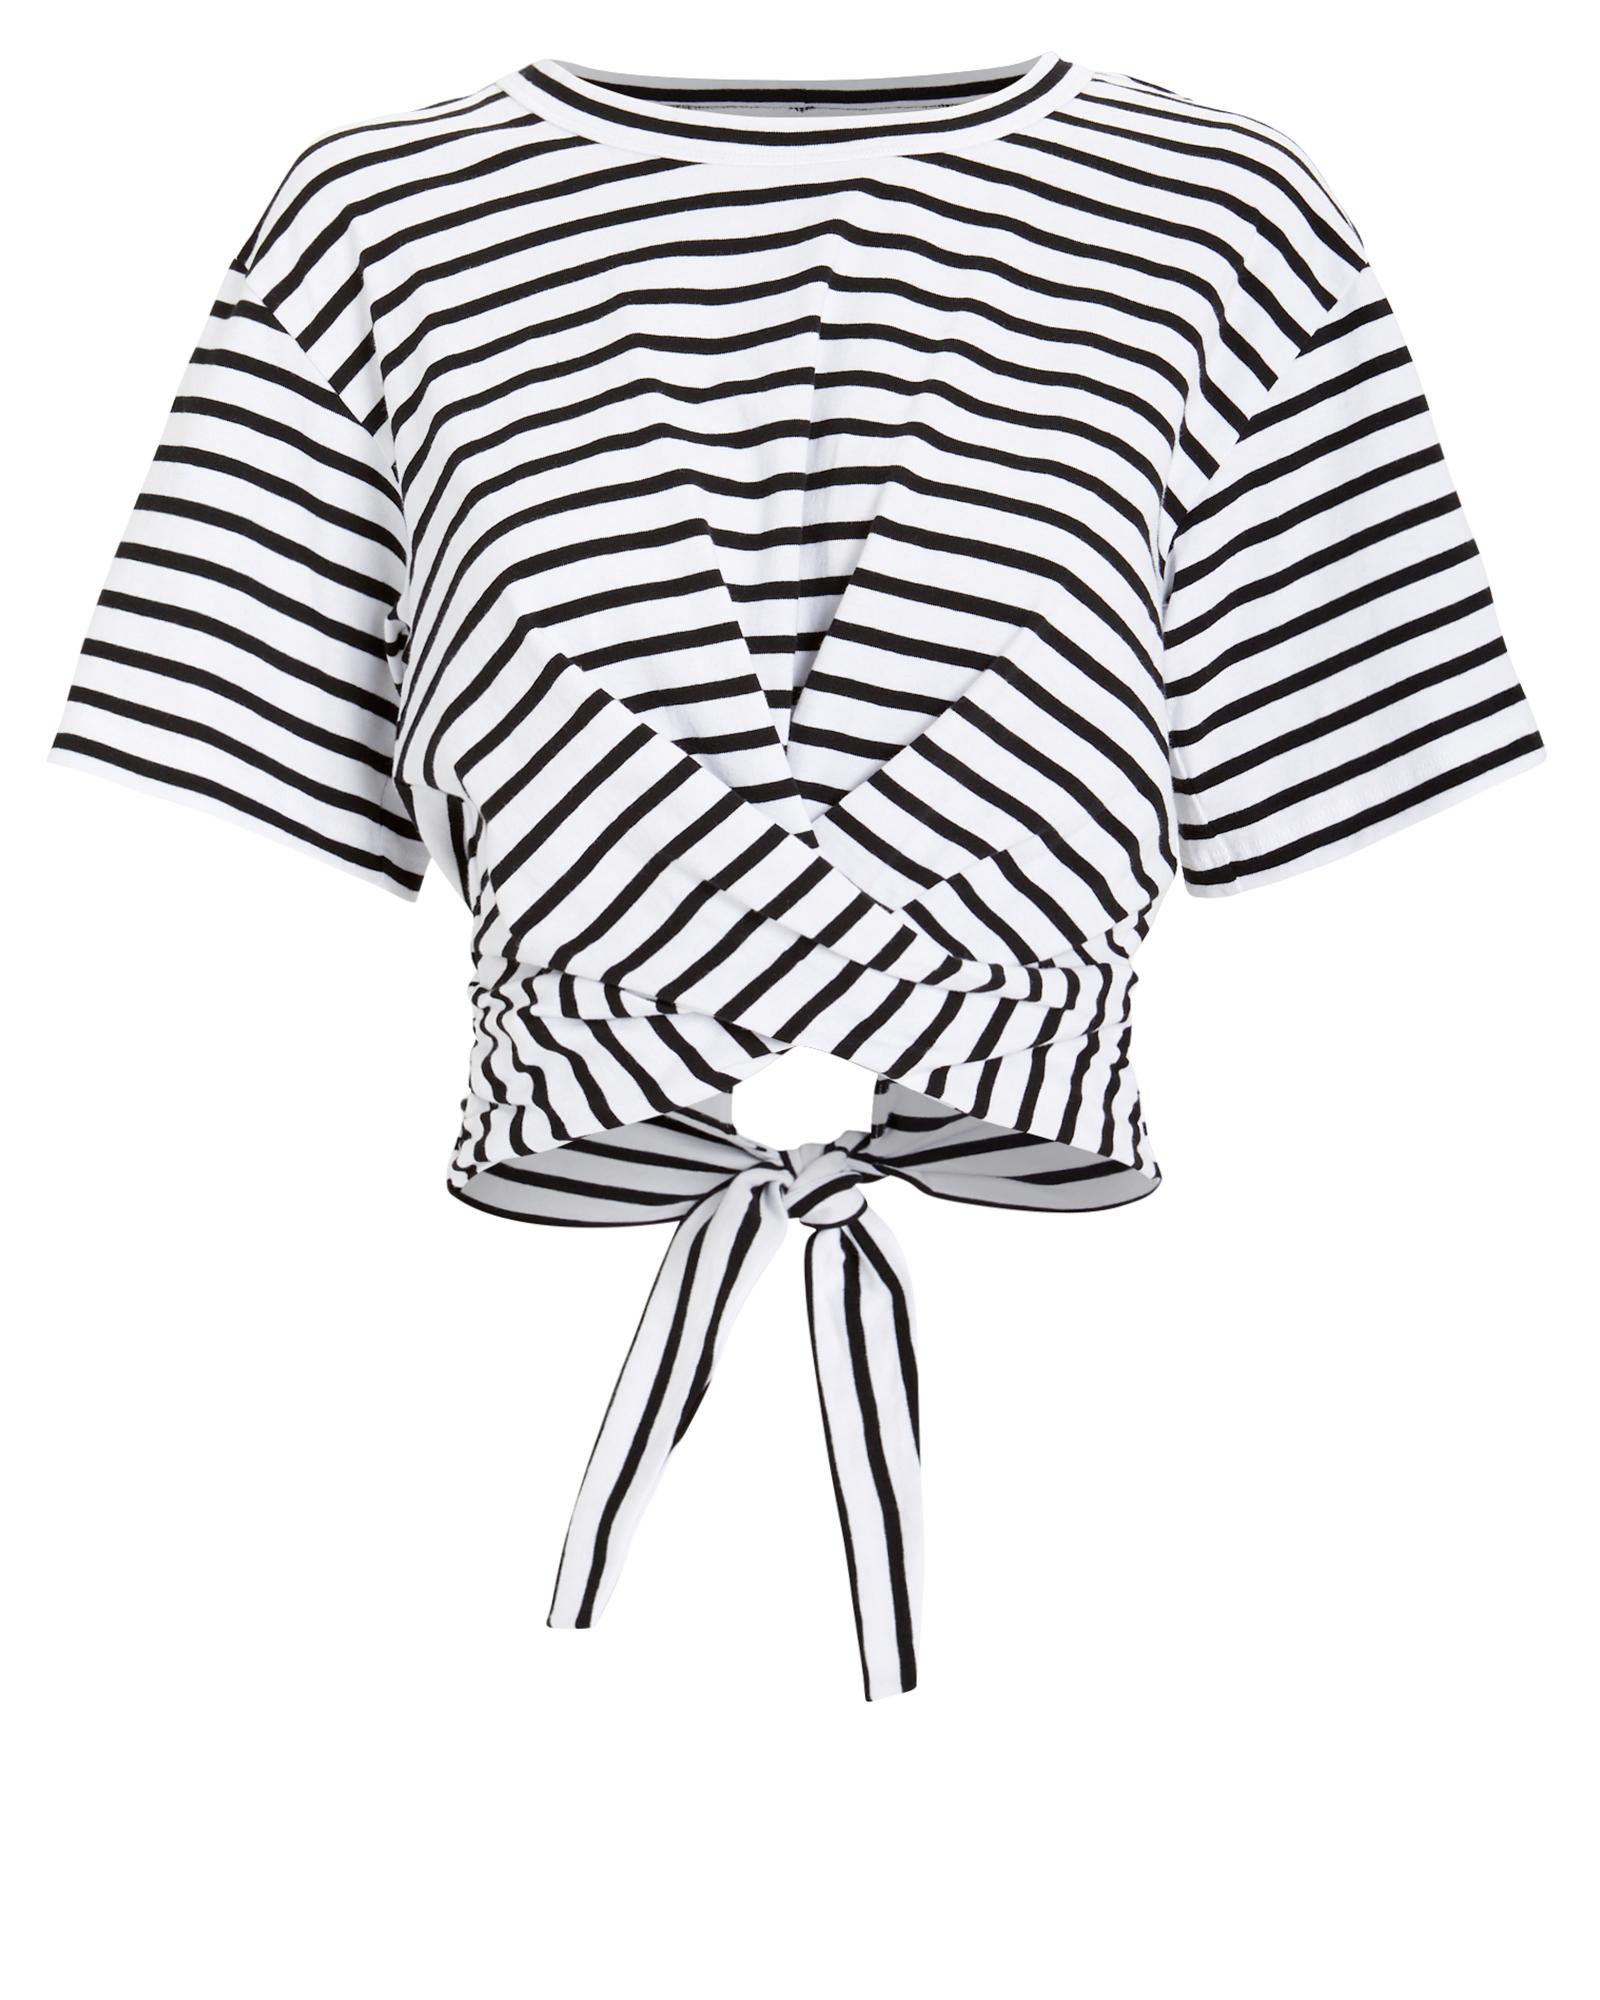 A.l.c T-shirts A.L.C. JULES T-SHIRT  WHITE/BLACK STRIPES S